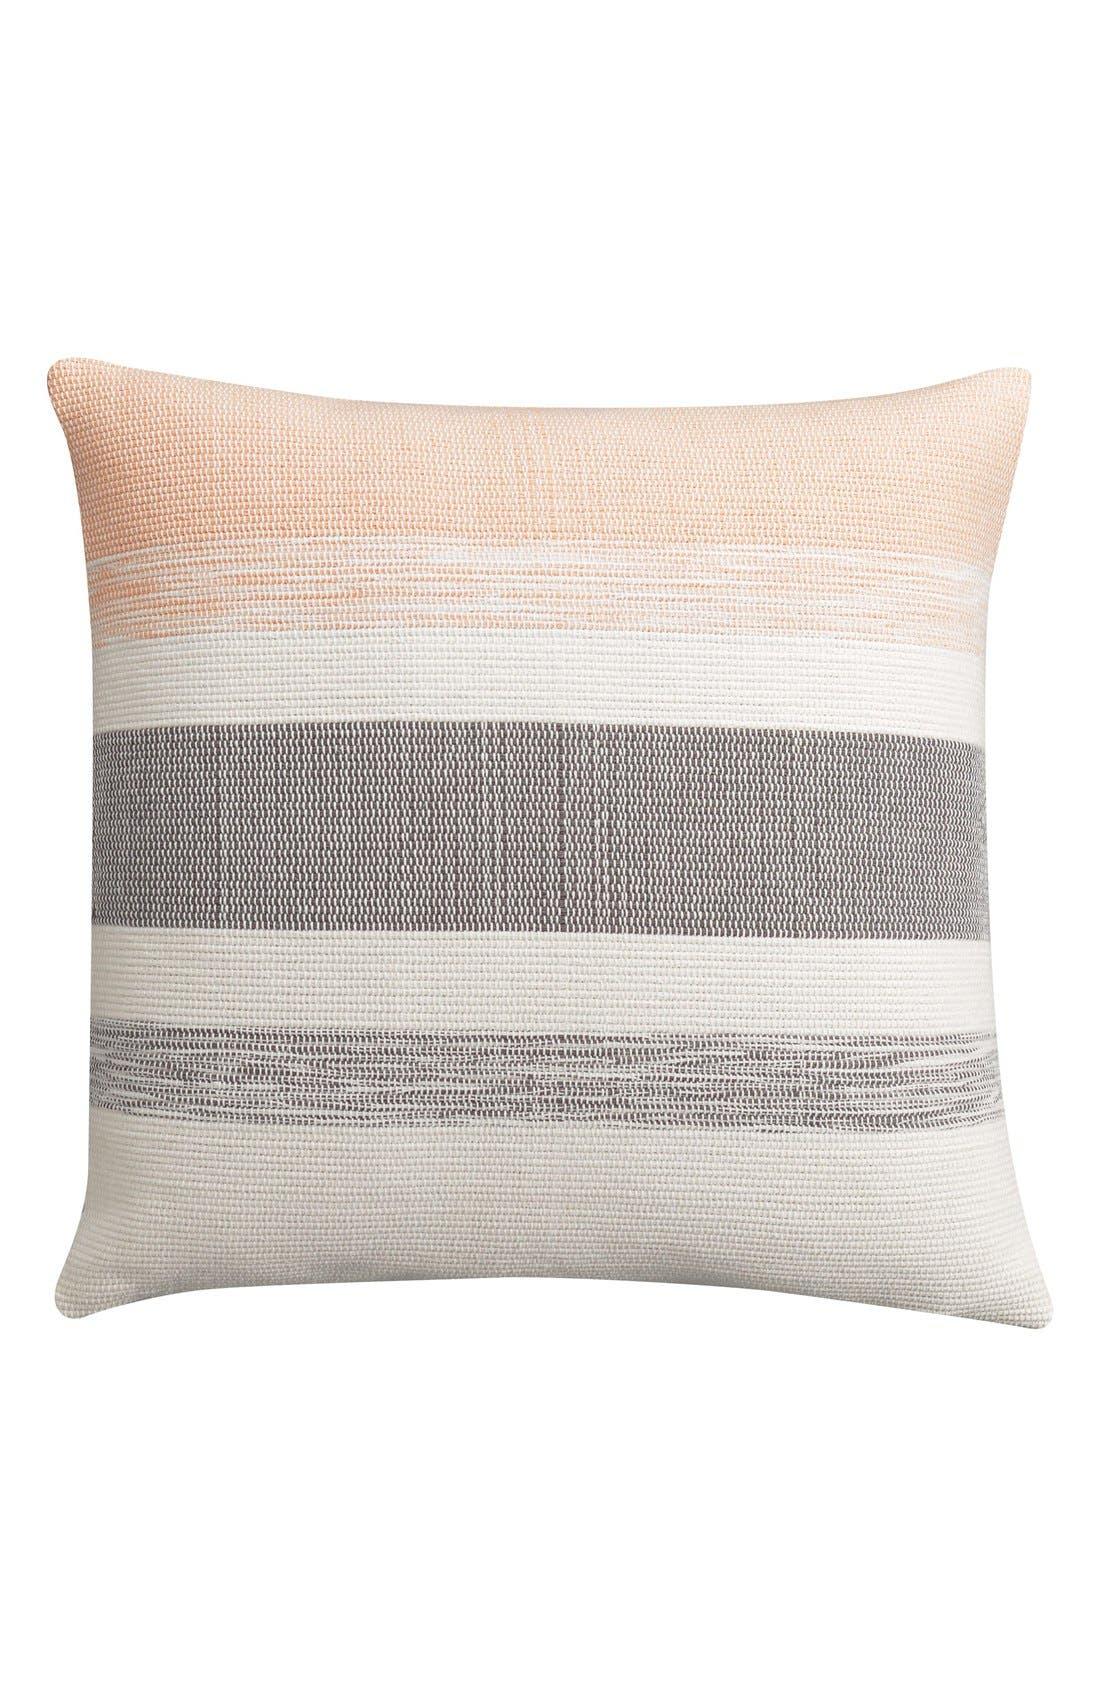 Stripe Accent Pillow,                         Main,                         color, Grey/ Multi